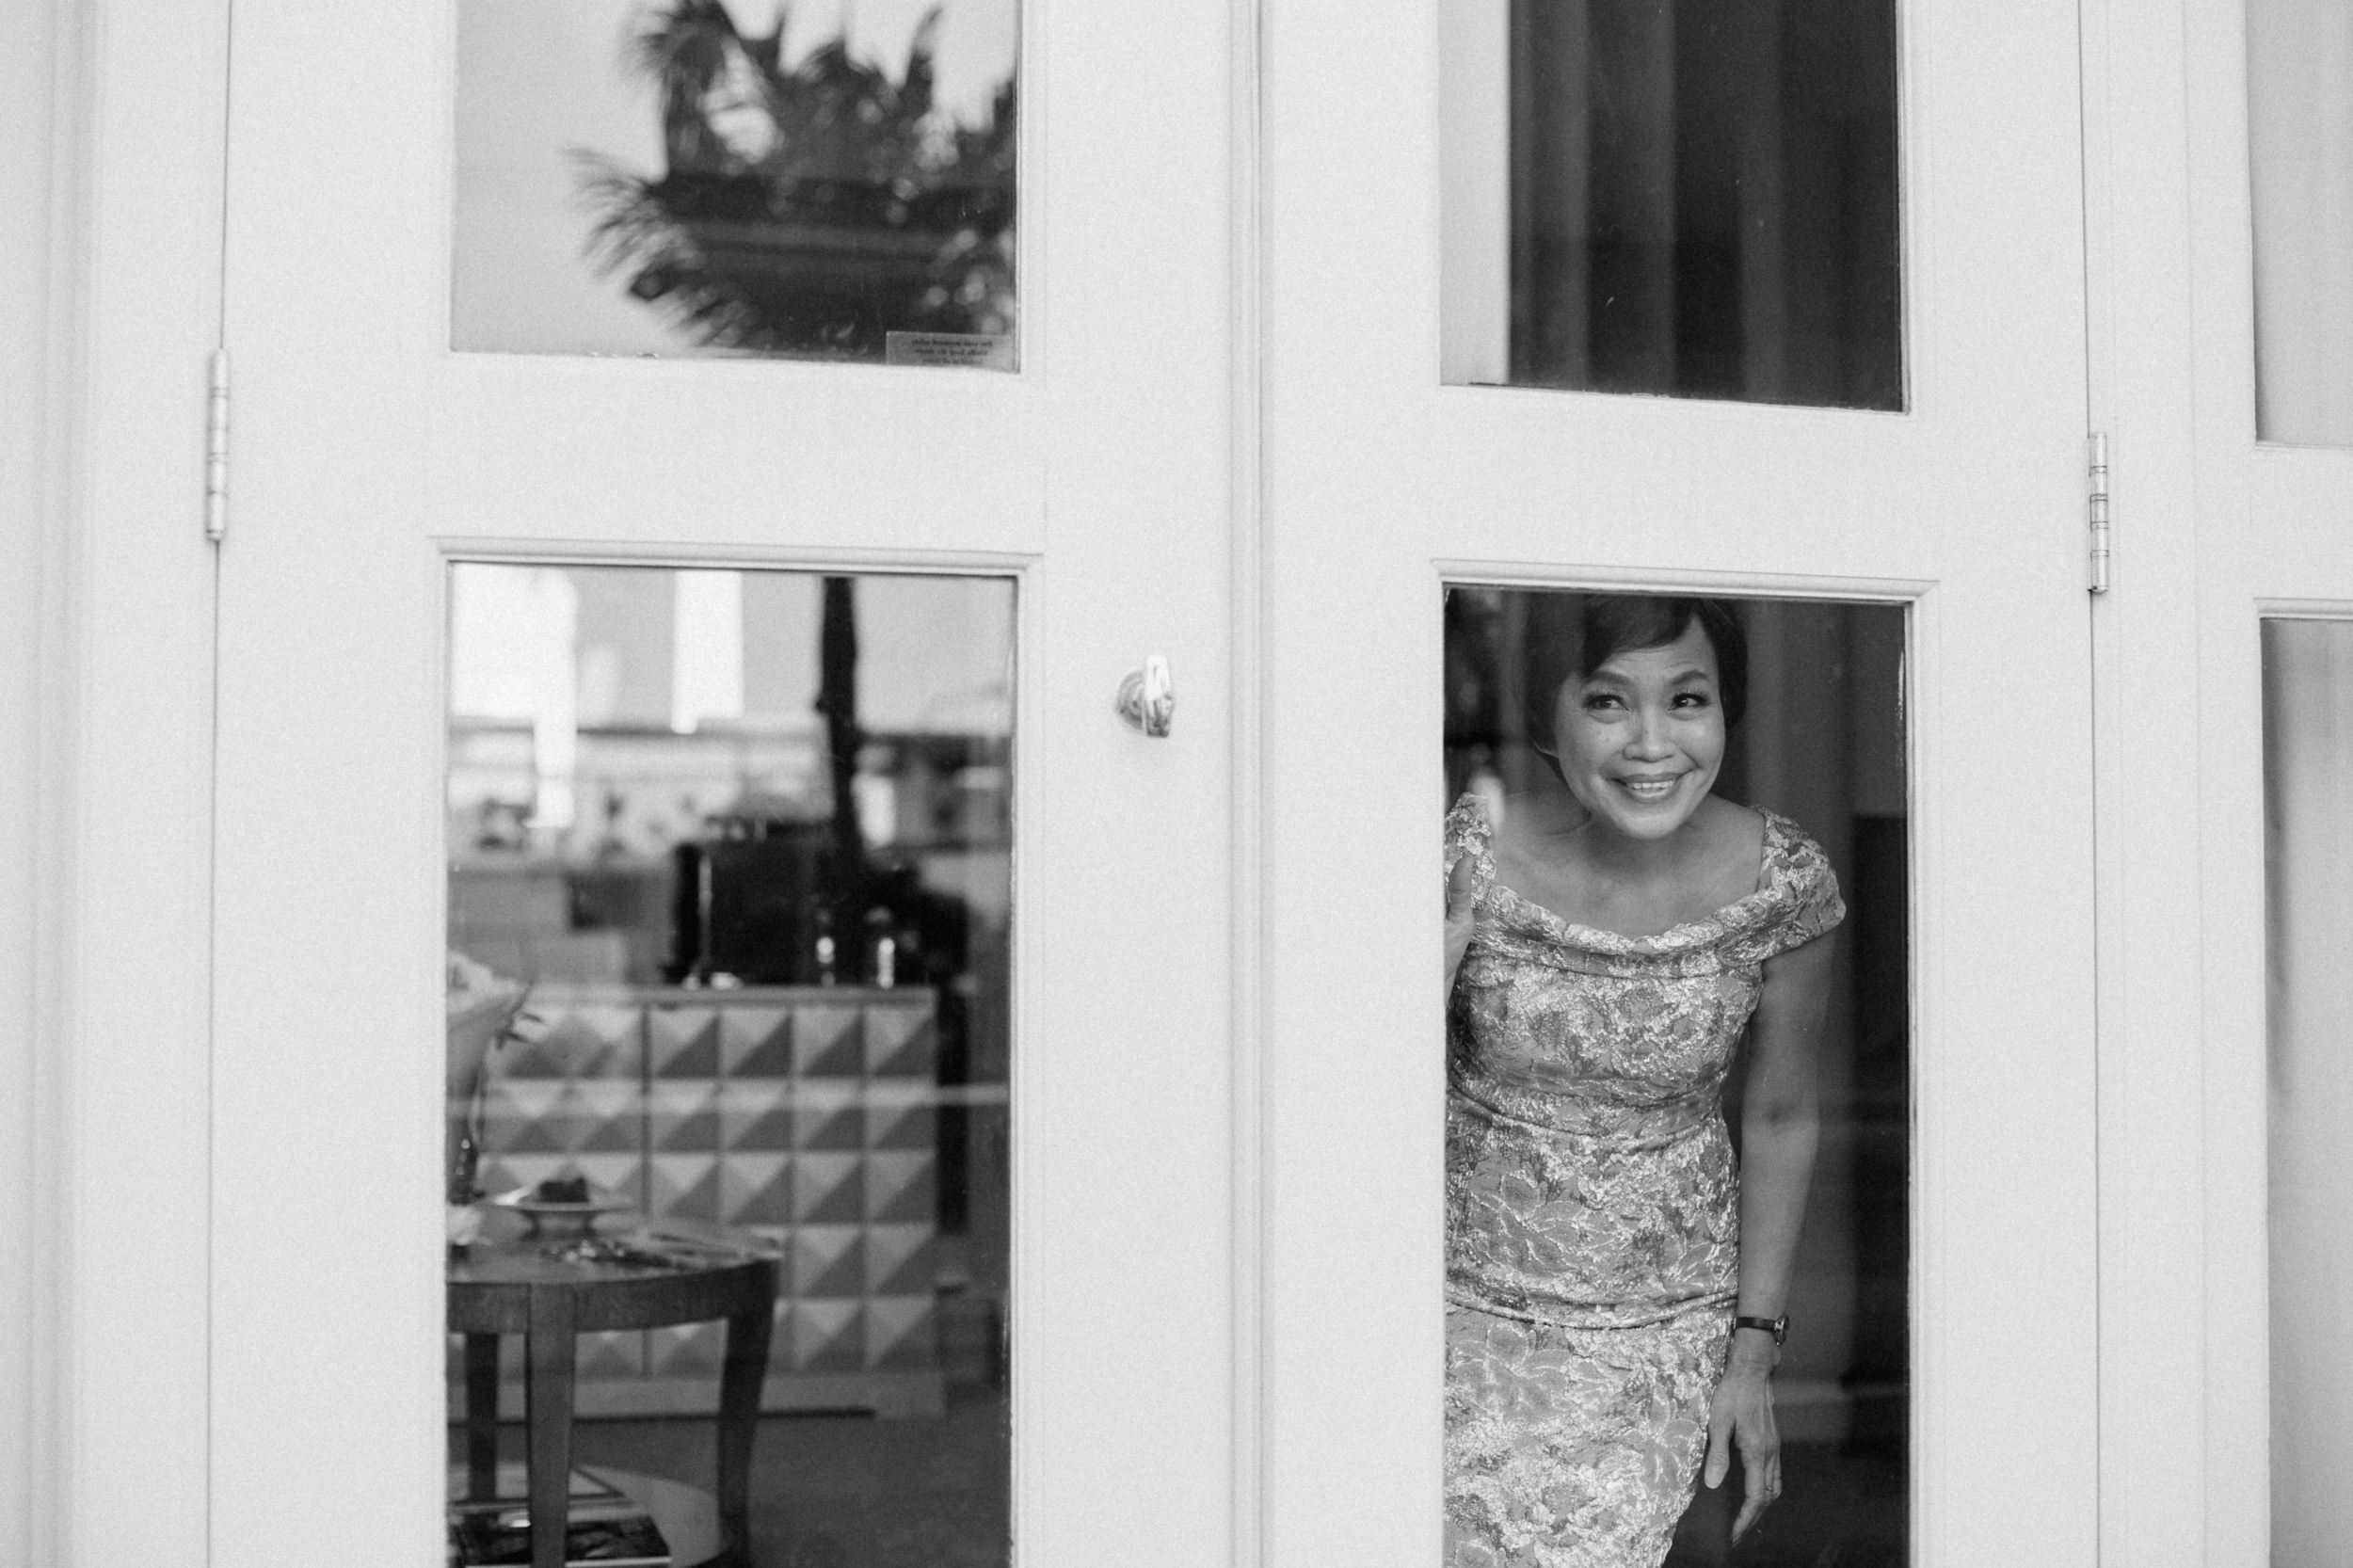 singapore-wedding-photographer-cheryl-matthew-fullerton-hotel-wedding-39.jpg